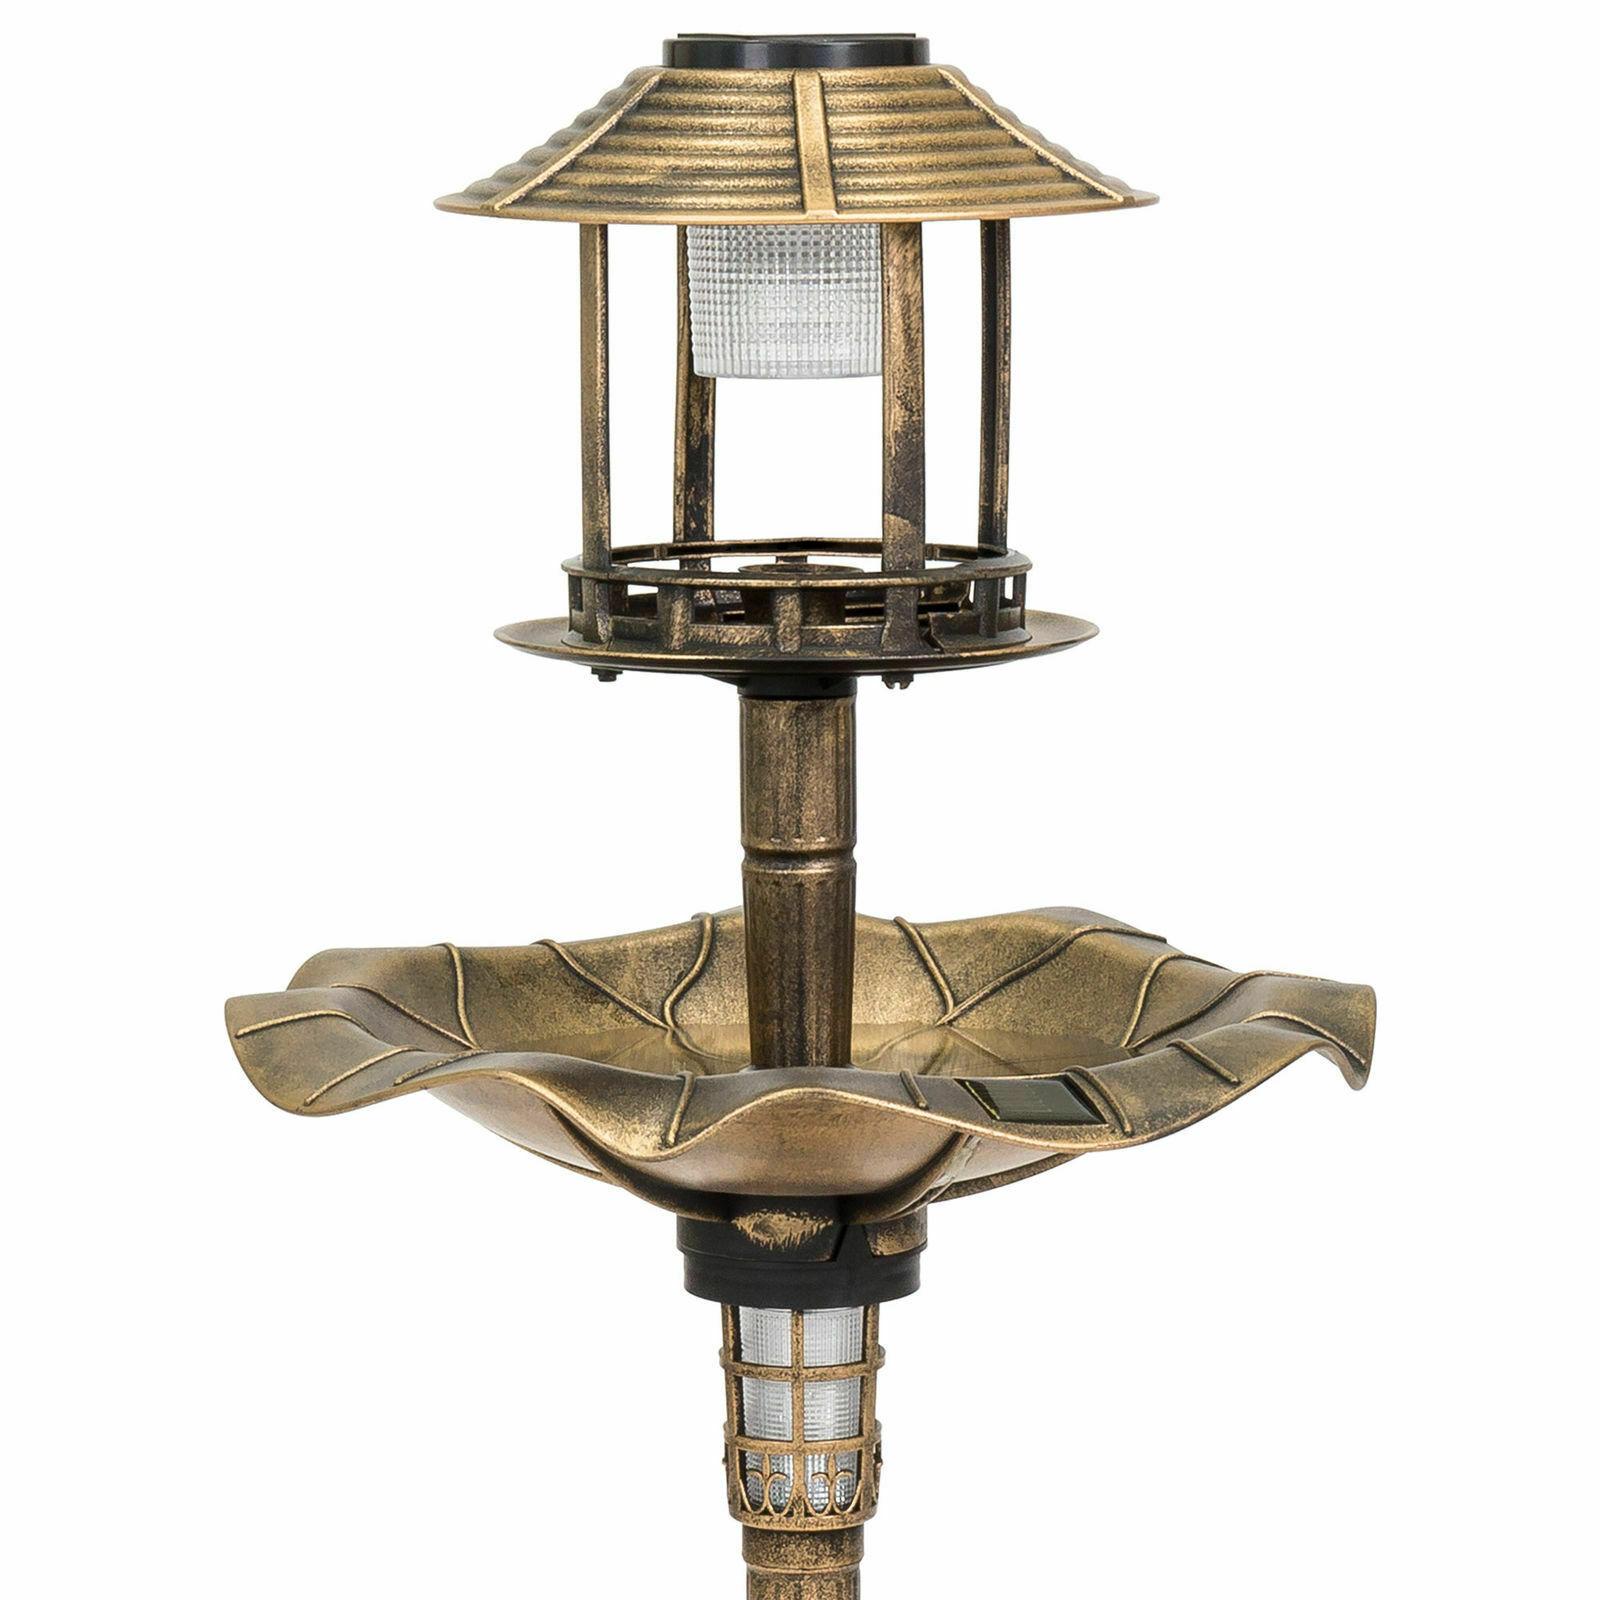 Outdoor Bronze Solar LED Light Bird Bath Water Bowl Garden Flower Planter Decor